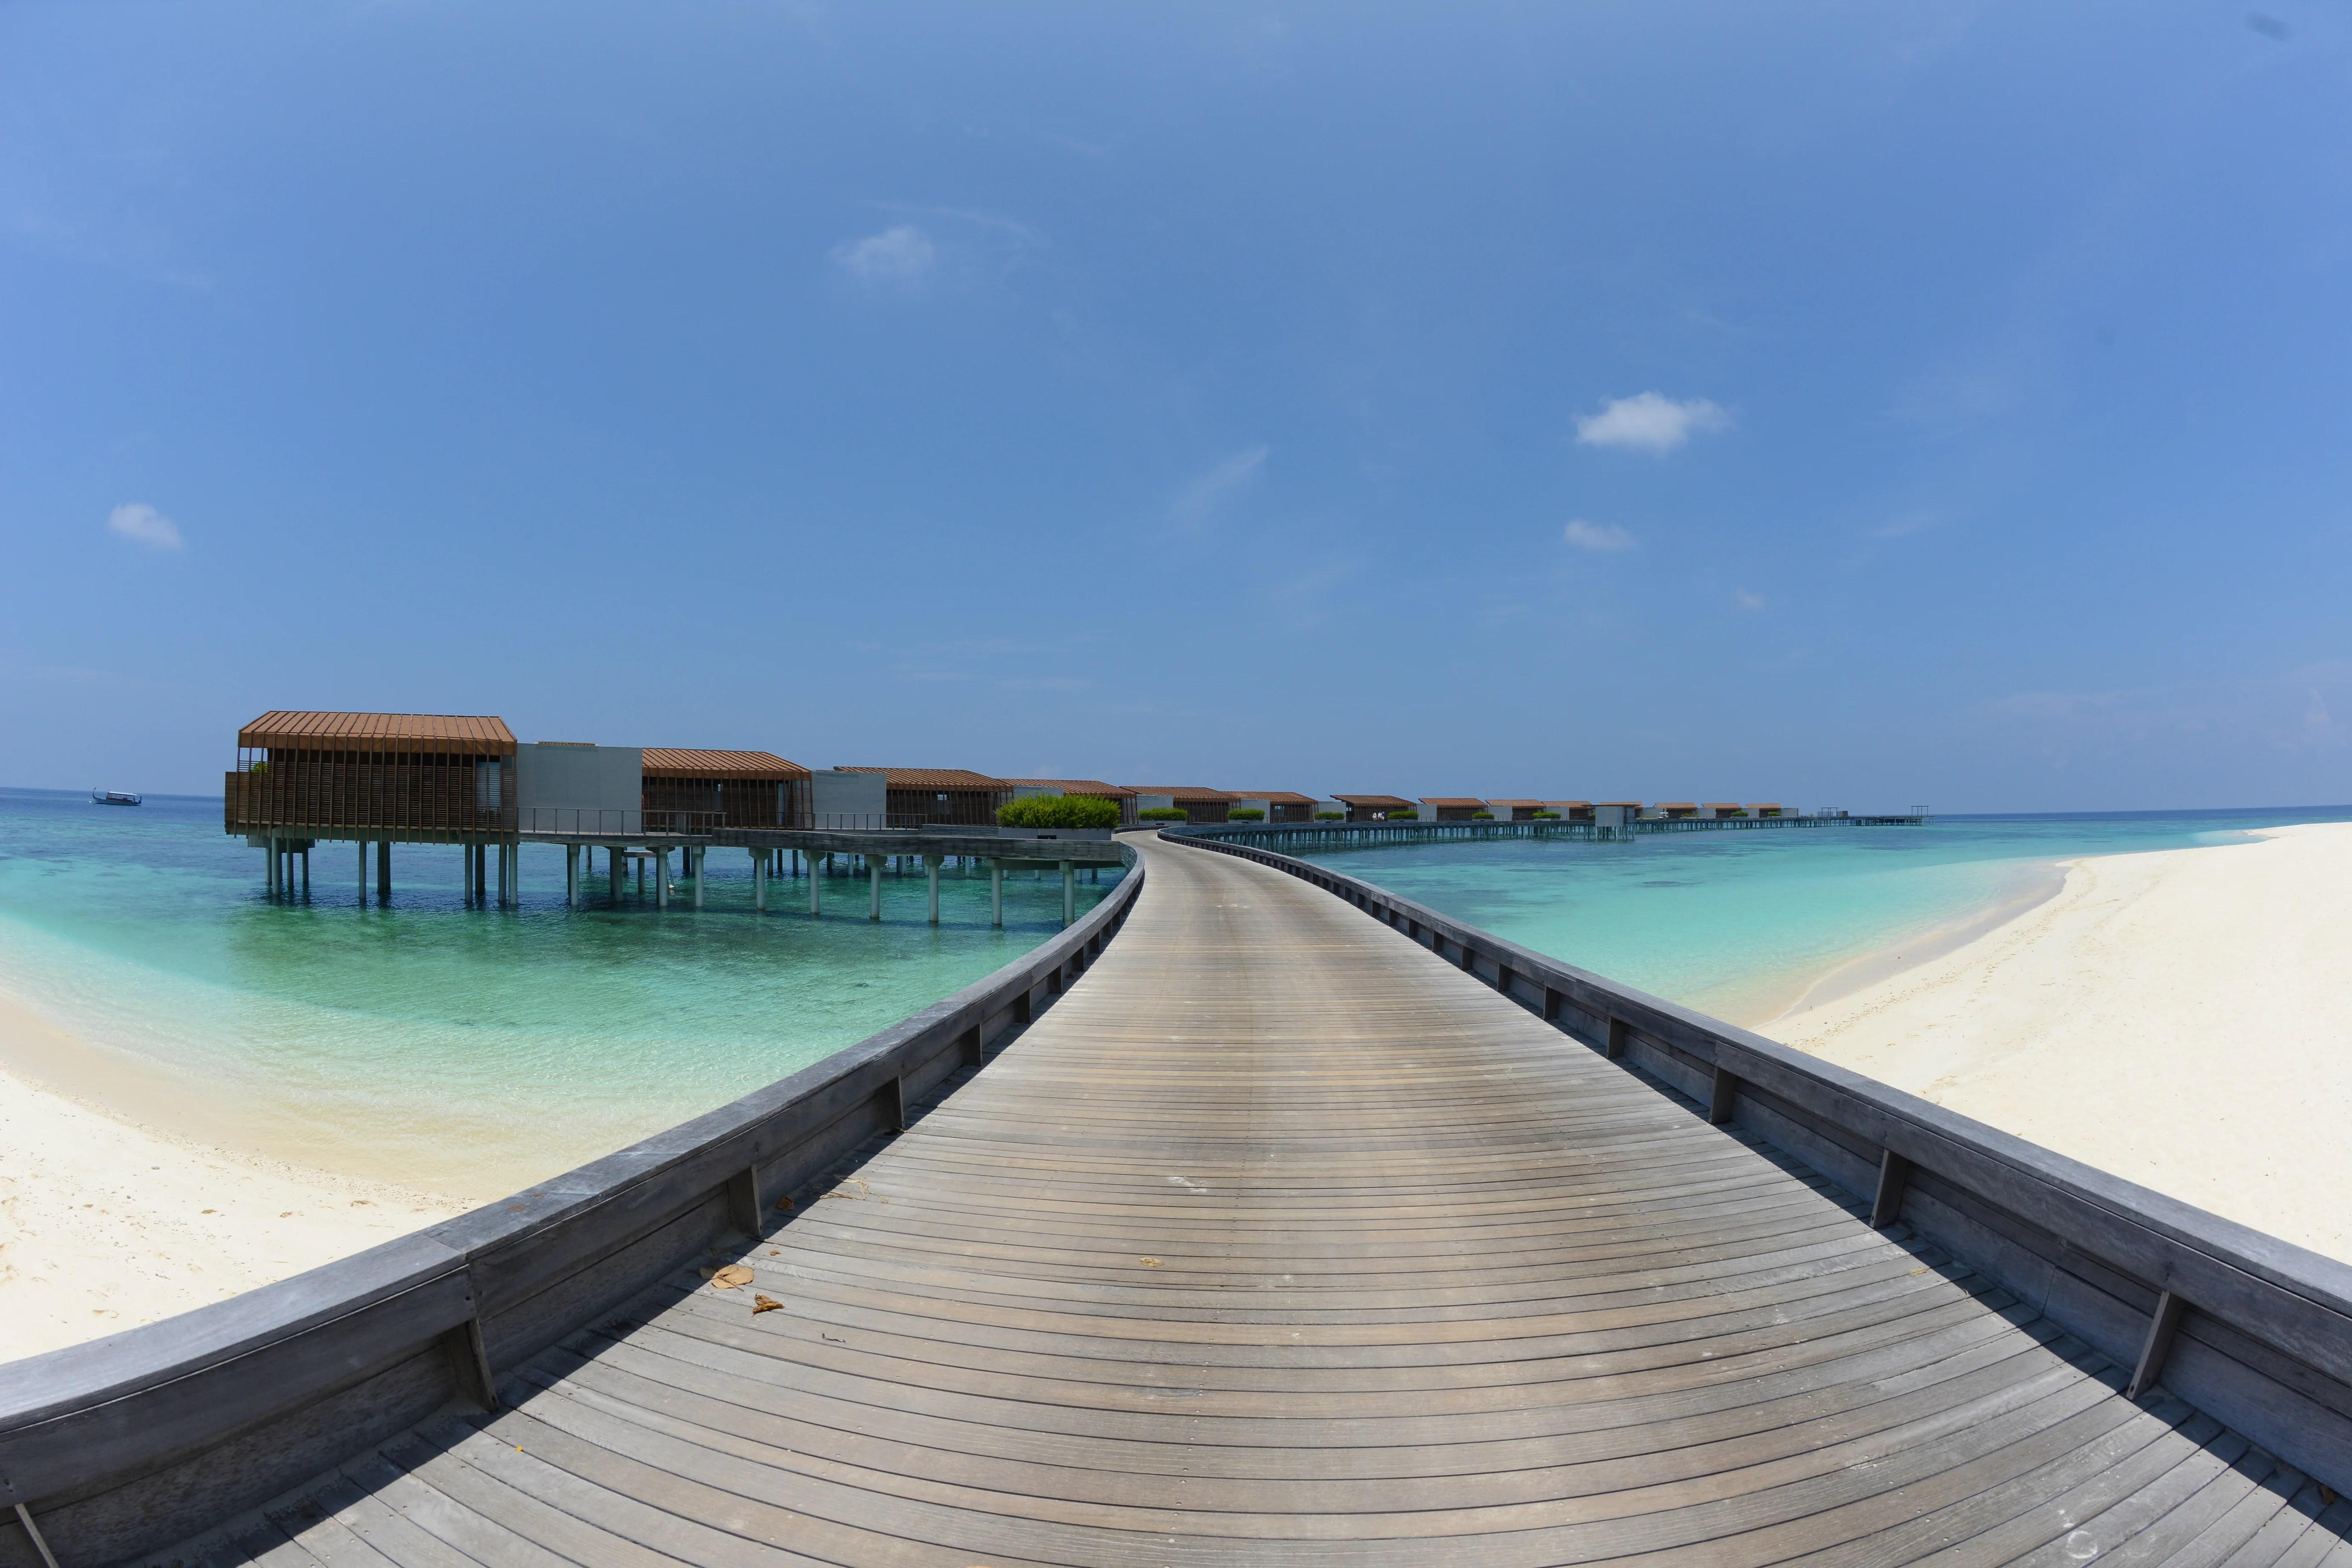 park hyatt hadahaa maldives overwater bungalow walkway